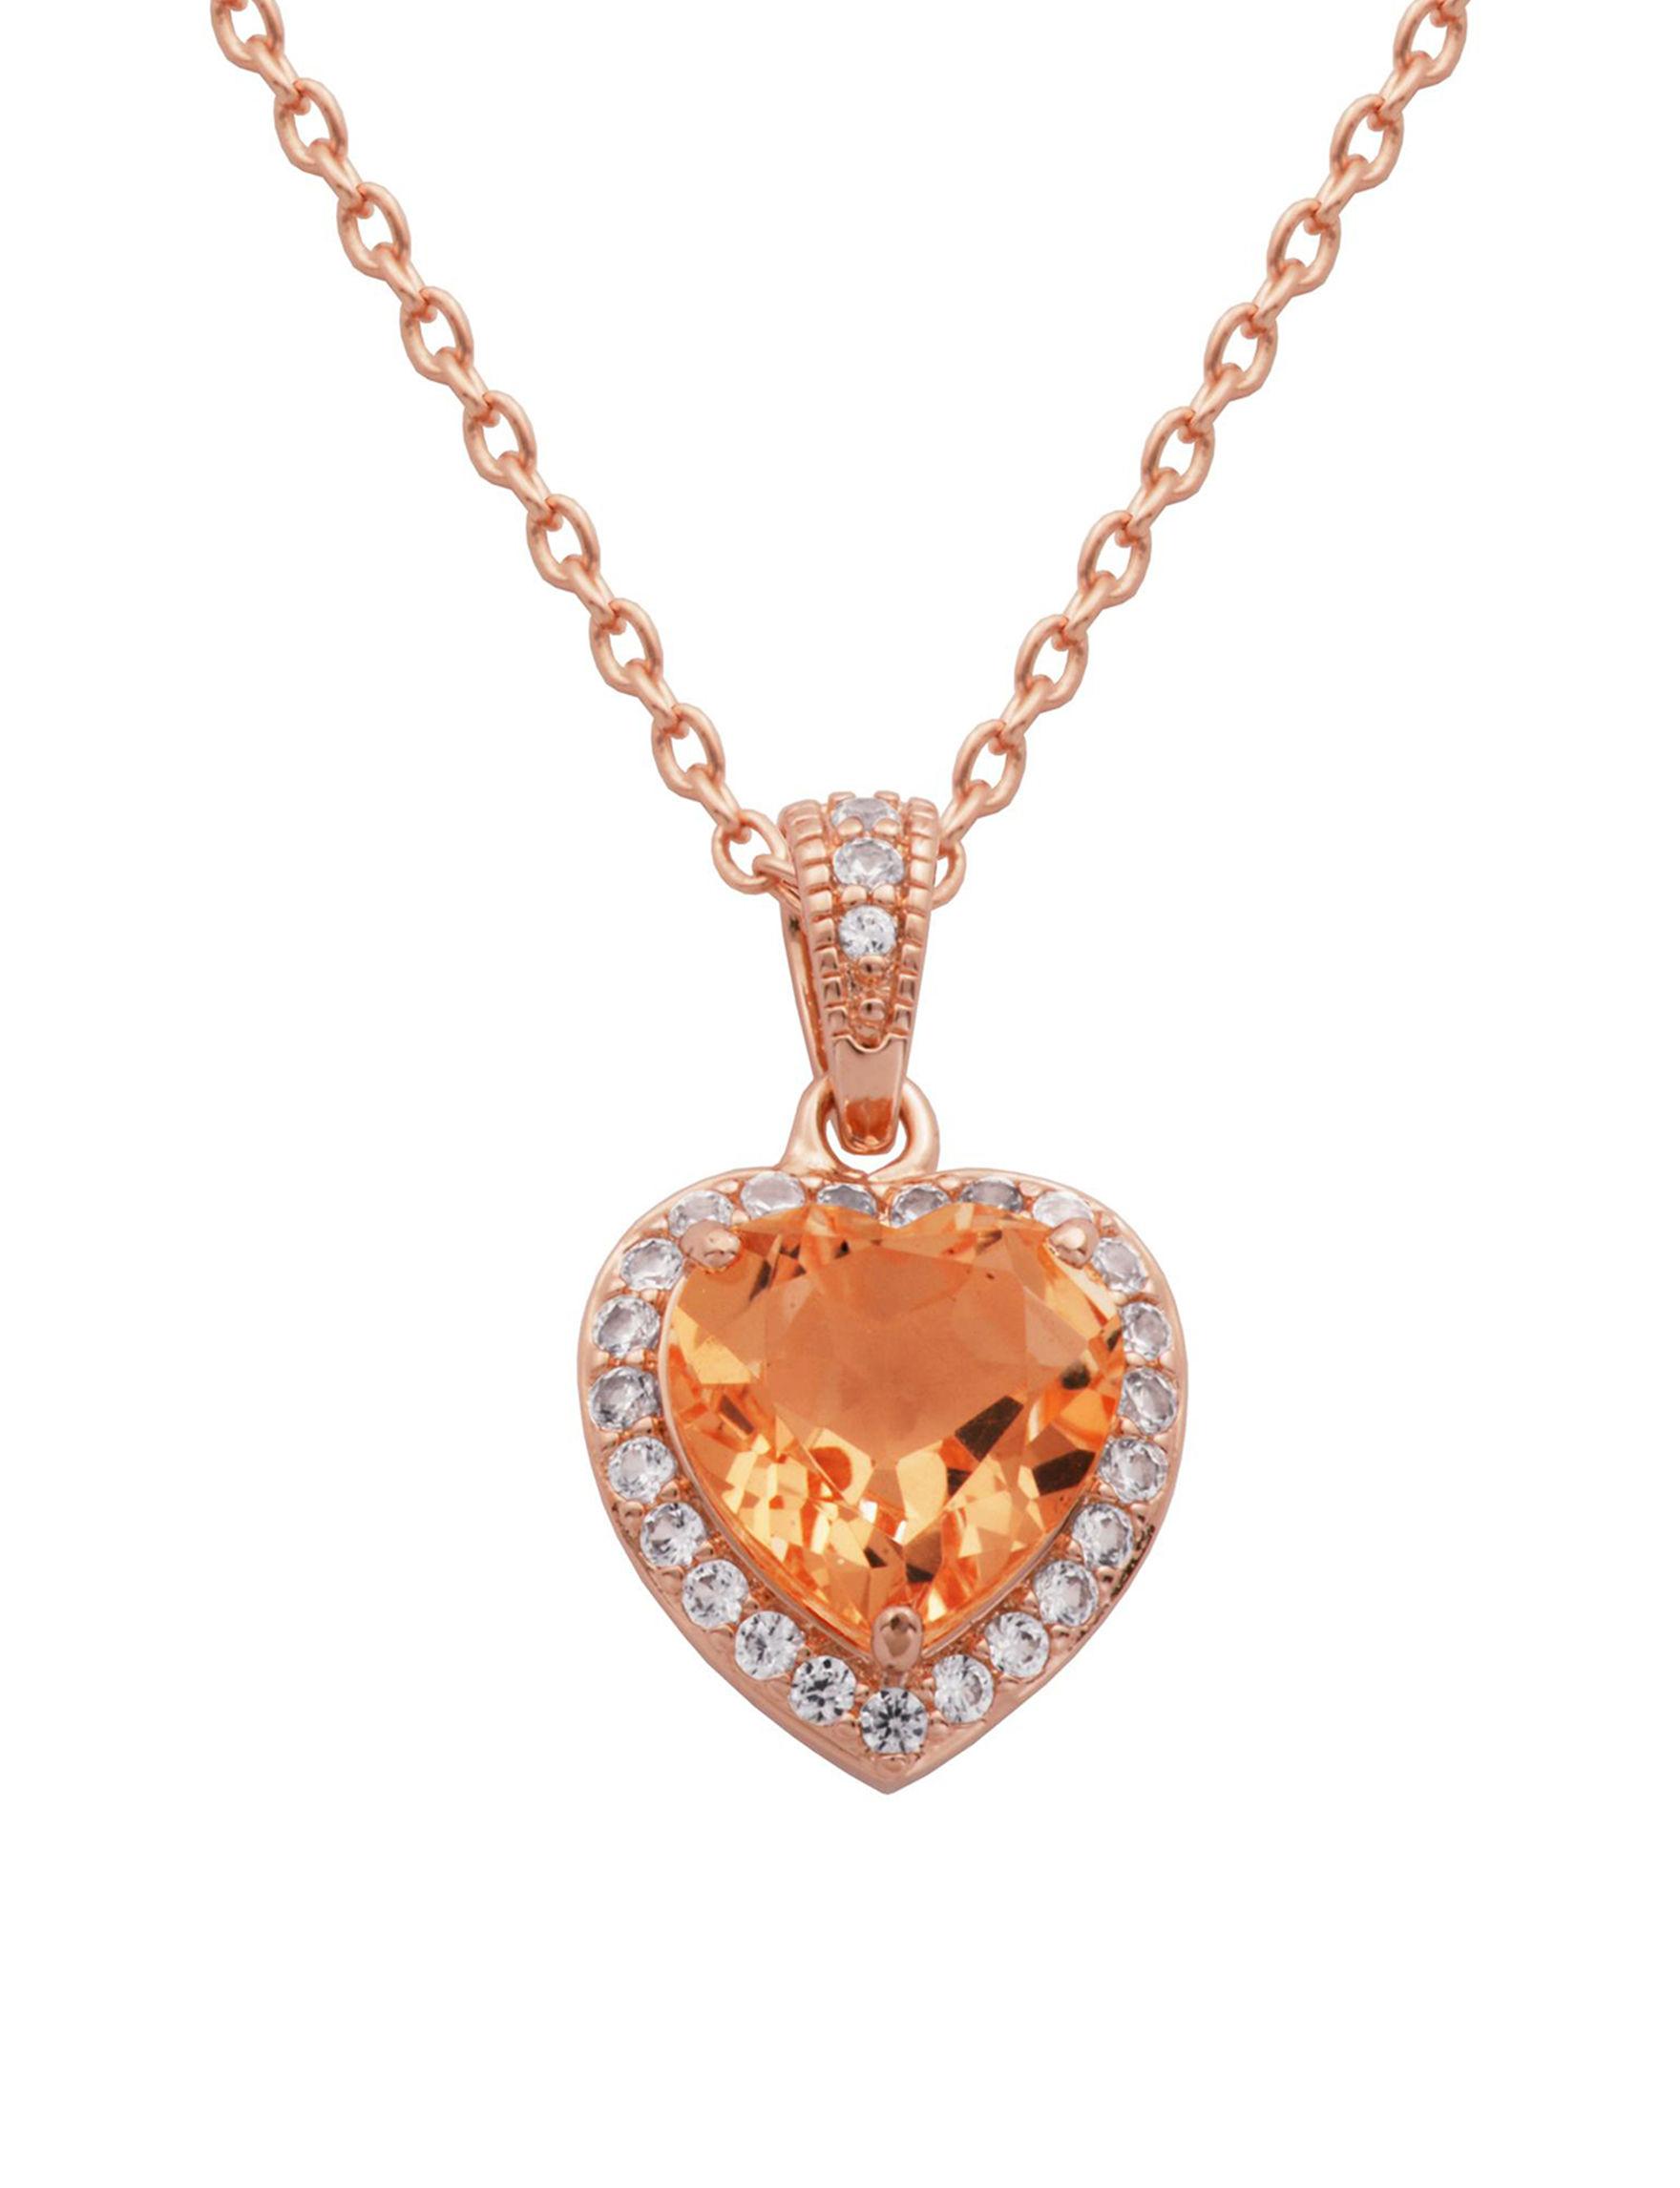 PAJ INC. Pink Necklaces & Pendants Fine Jewelry